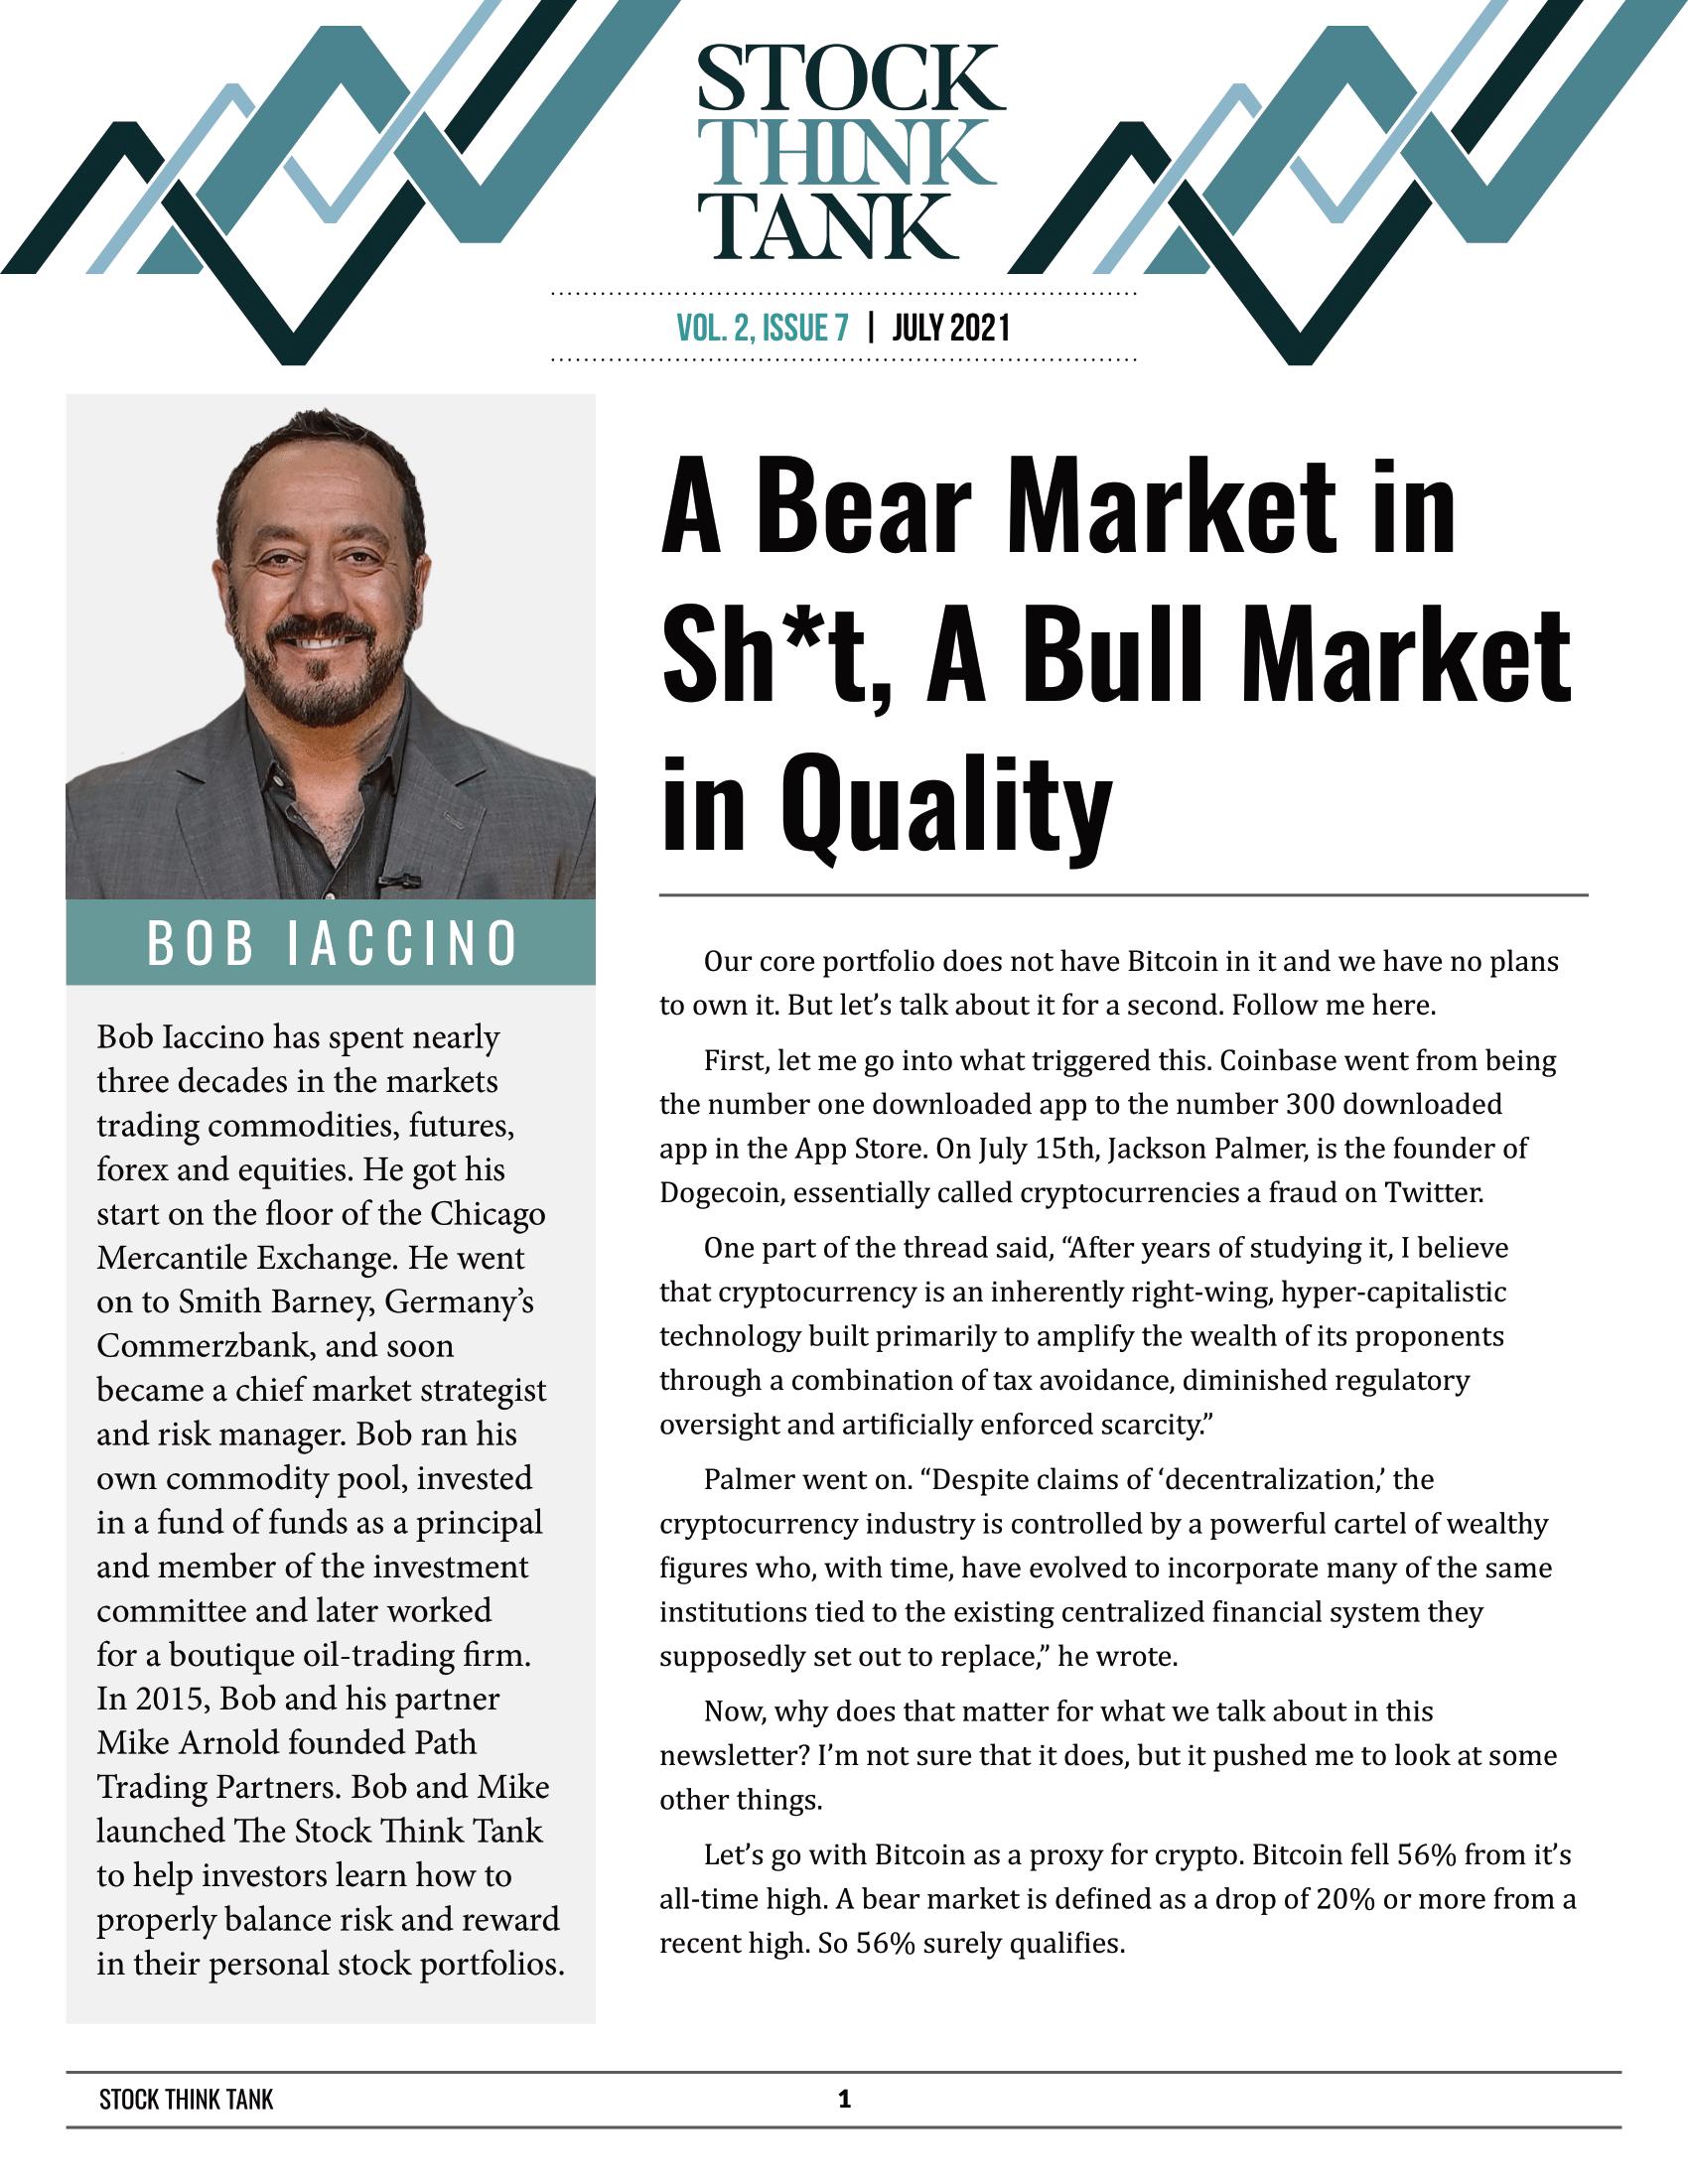 pdf-bob